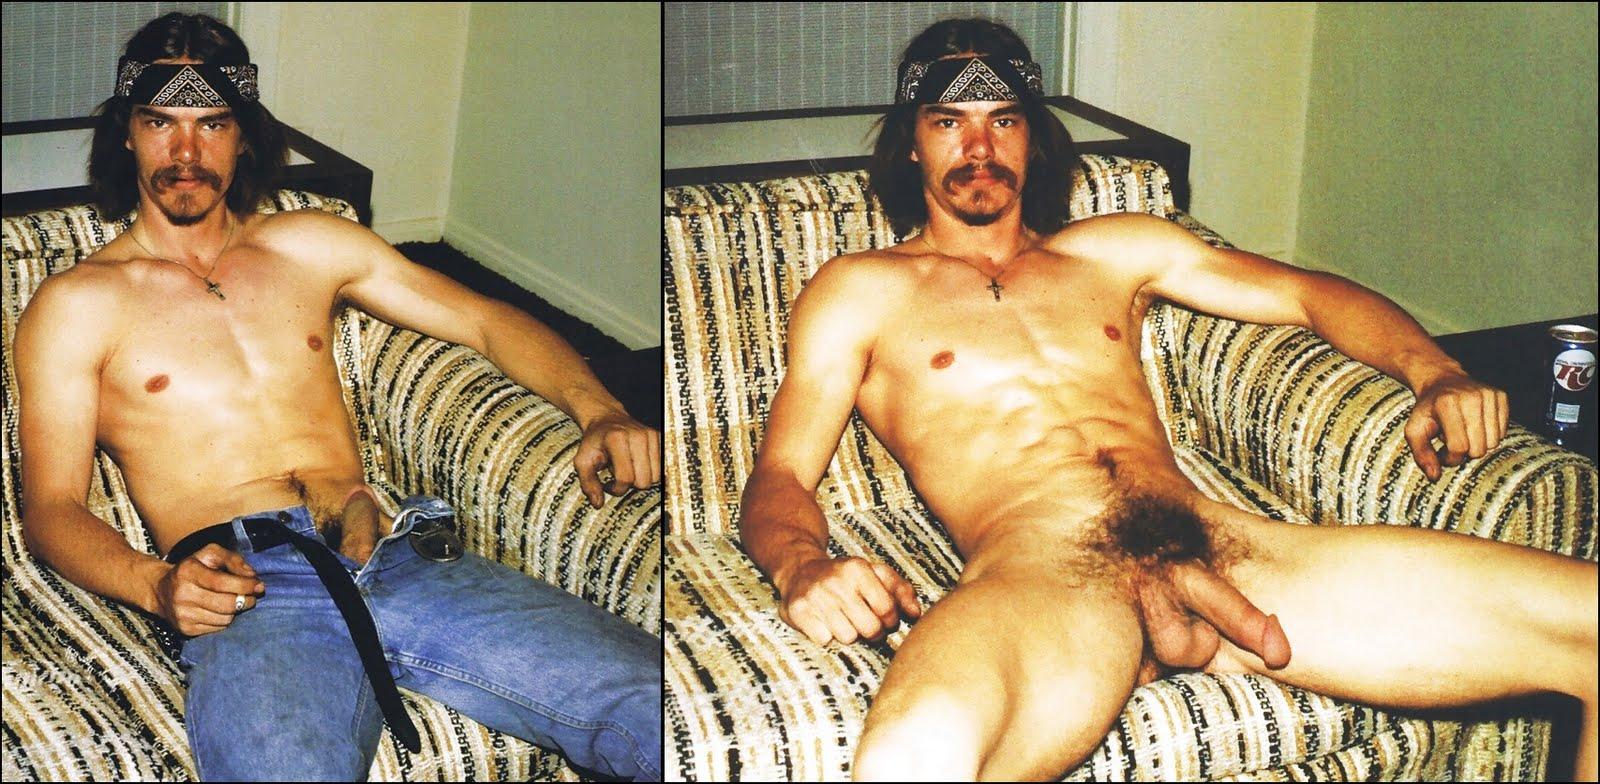 Man gay sex trailer free good playfellows